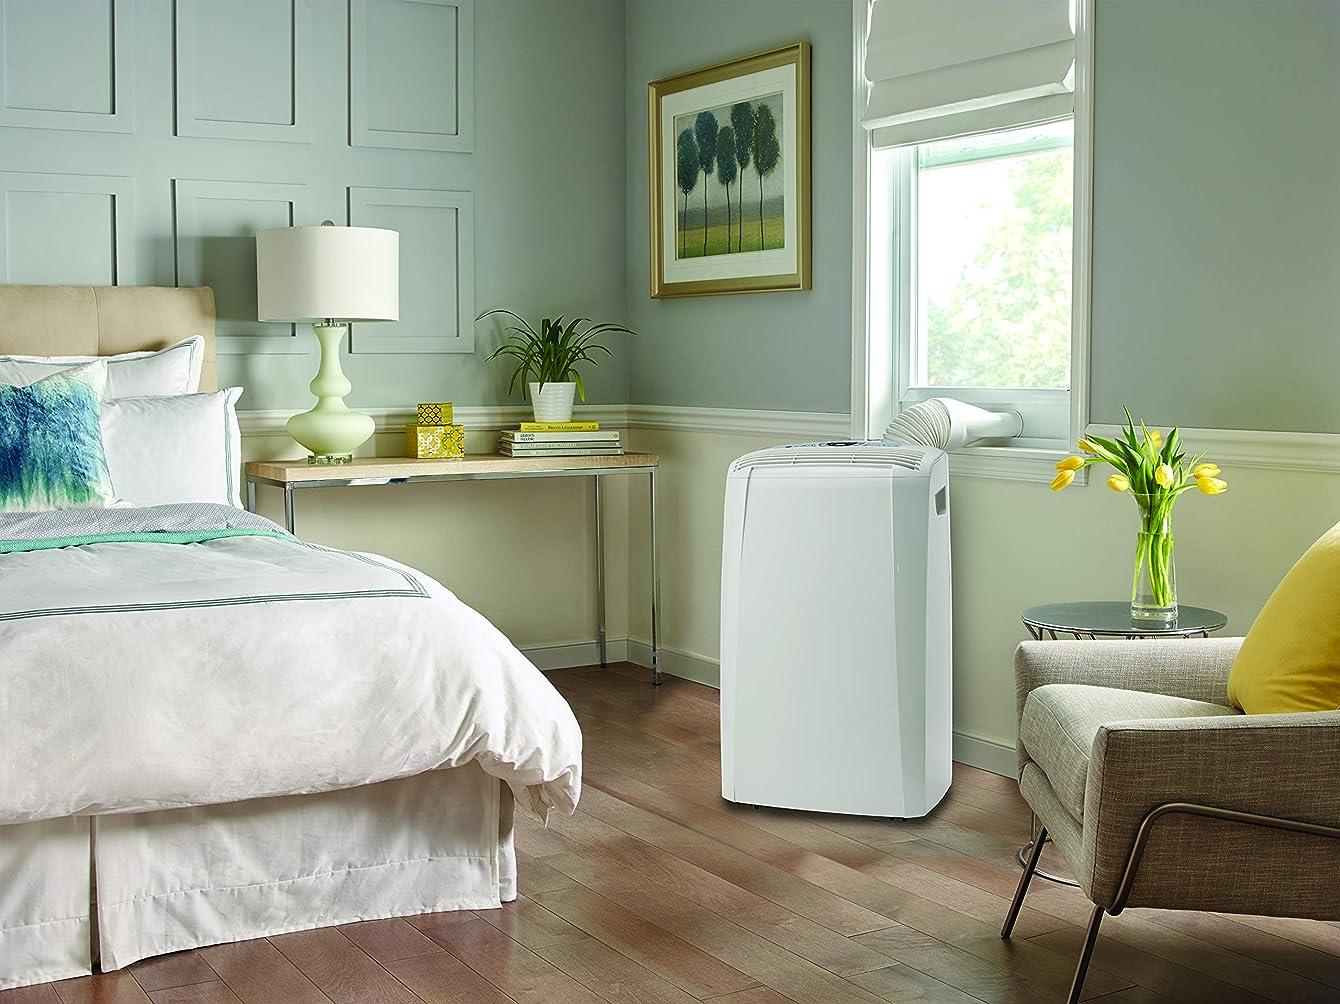 DeLonghi Portable 12,000 BTU Air Conditioner, White (Refurbished)